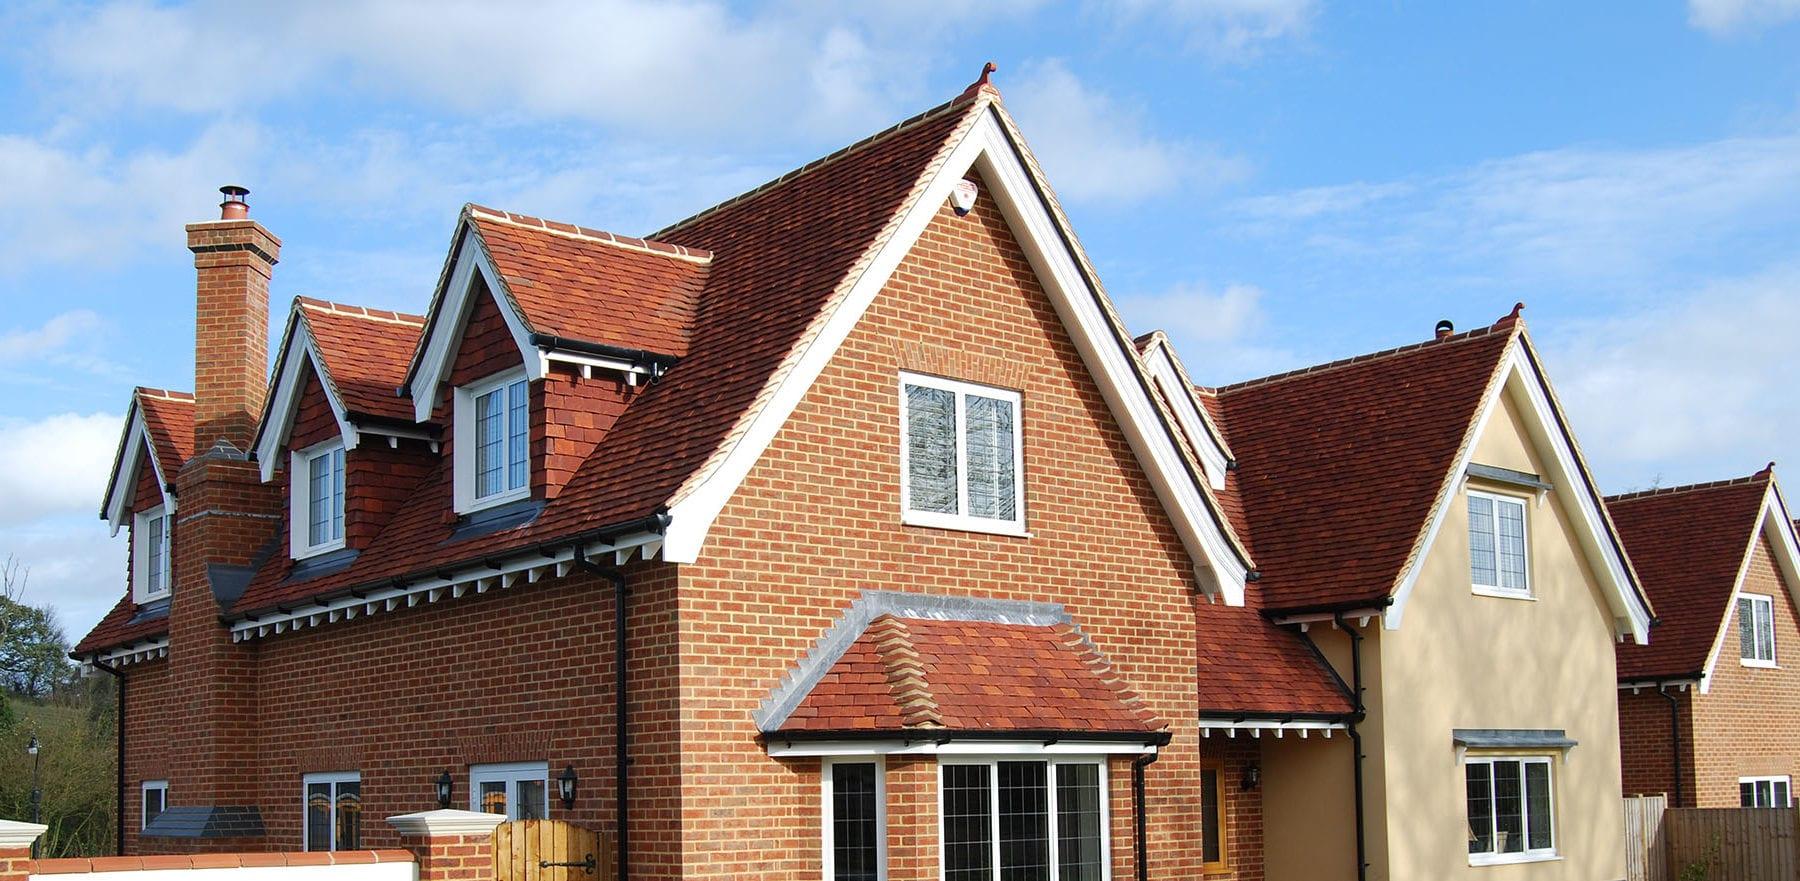 Lifestiles - Handmade Red Clay Roof Tiles - Rudley Oaks, England 5